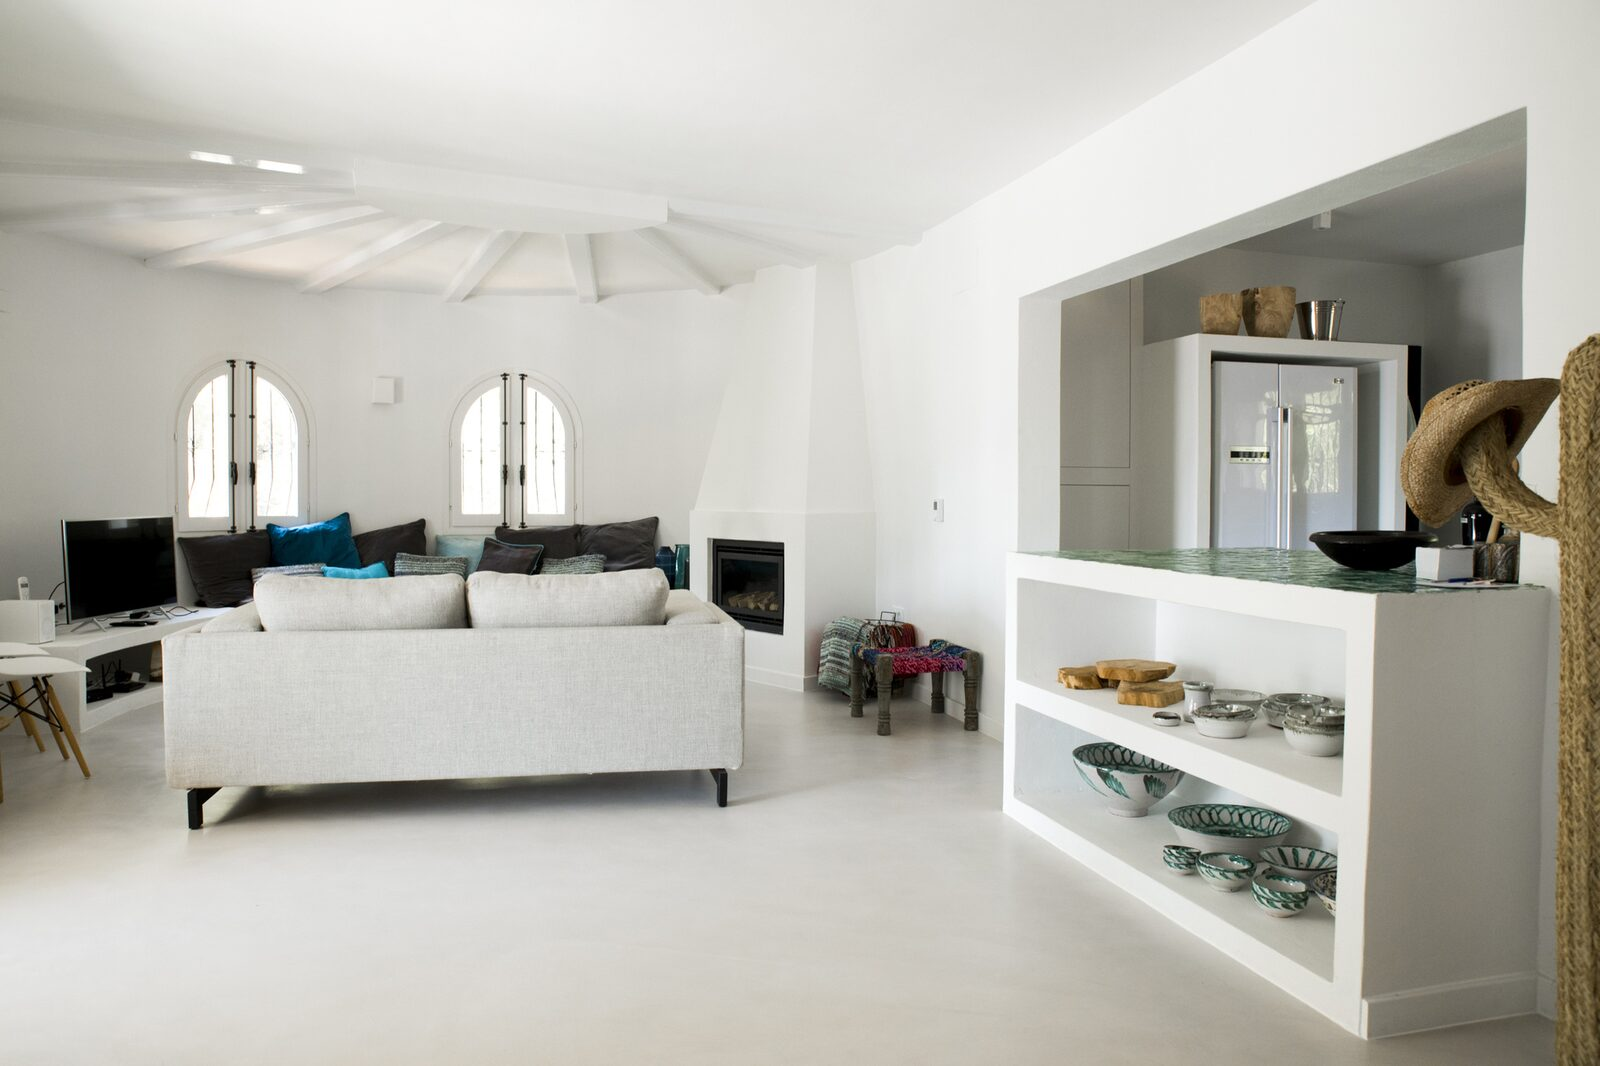 Casa Maribelle | 10 personen